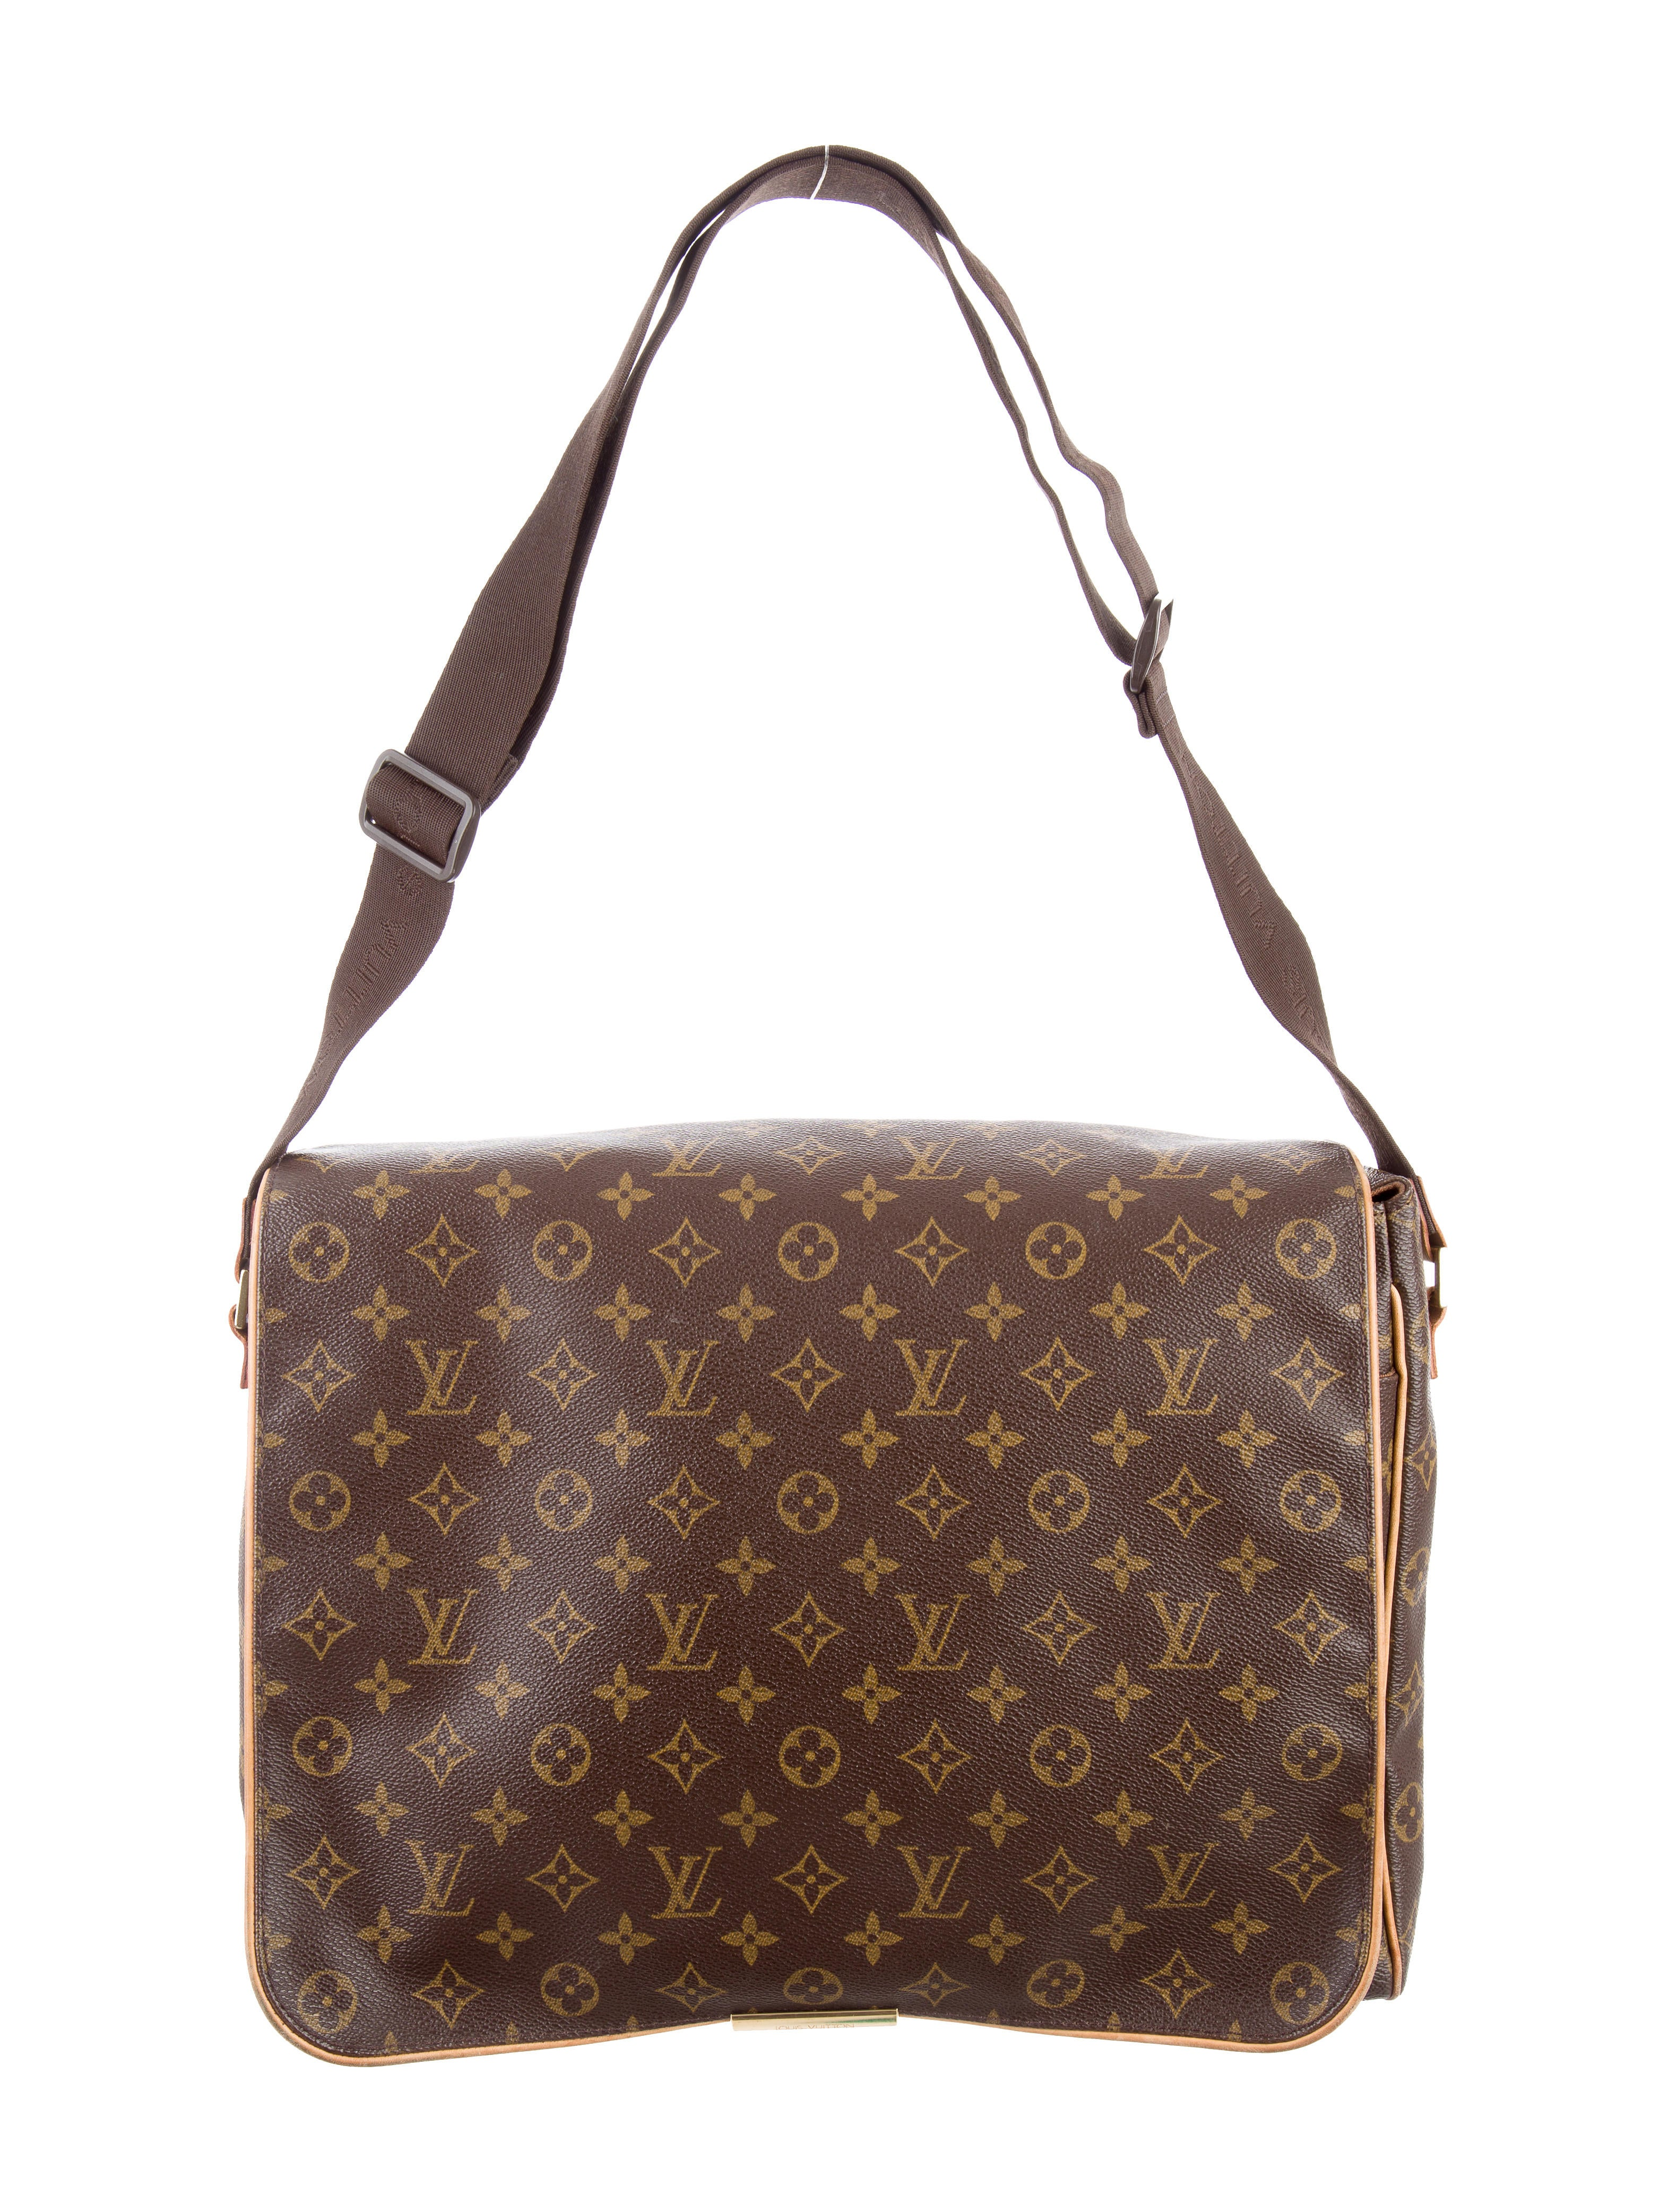 bb97df3860cb Louis Vuitton Monogram Abbesses Messenger Bag - Bags - LOU124437 ...